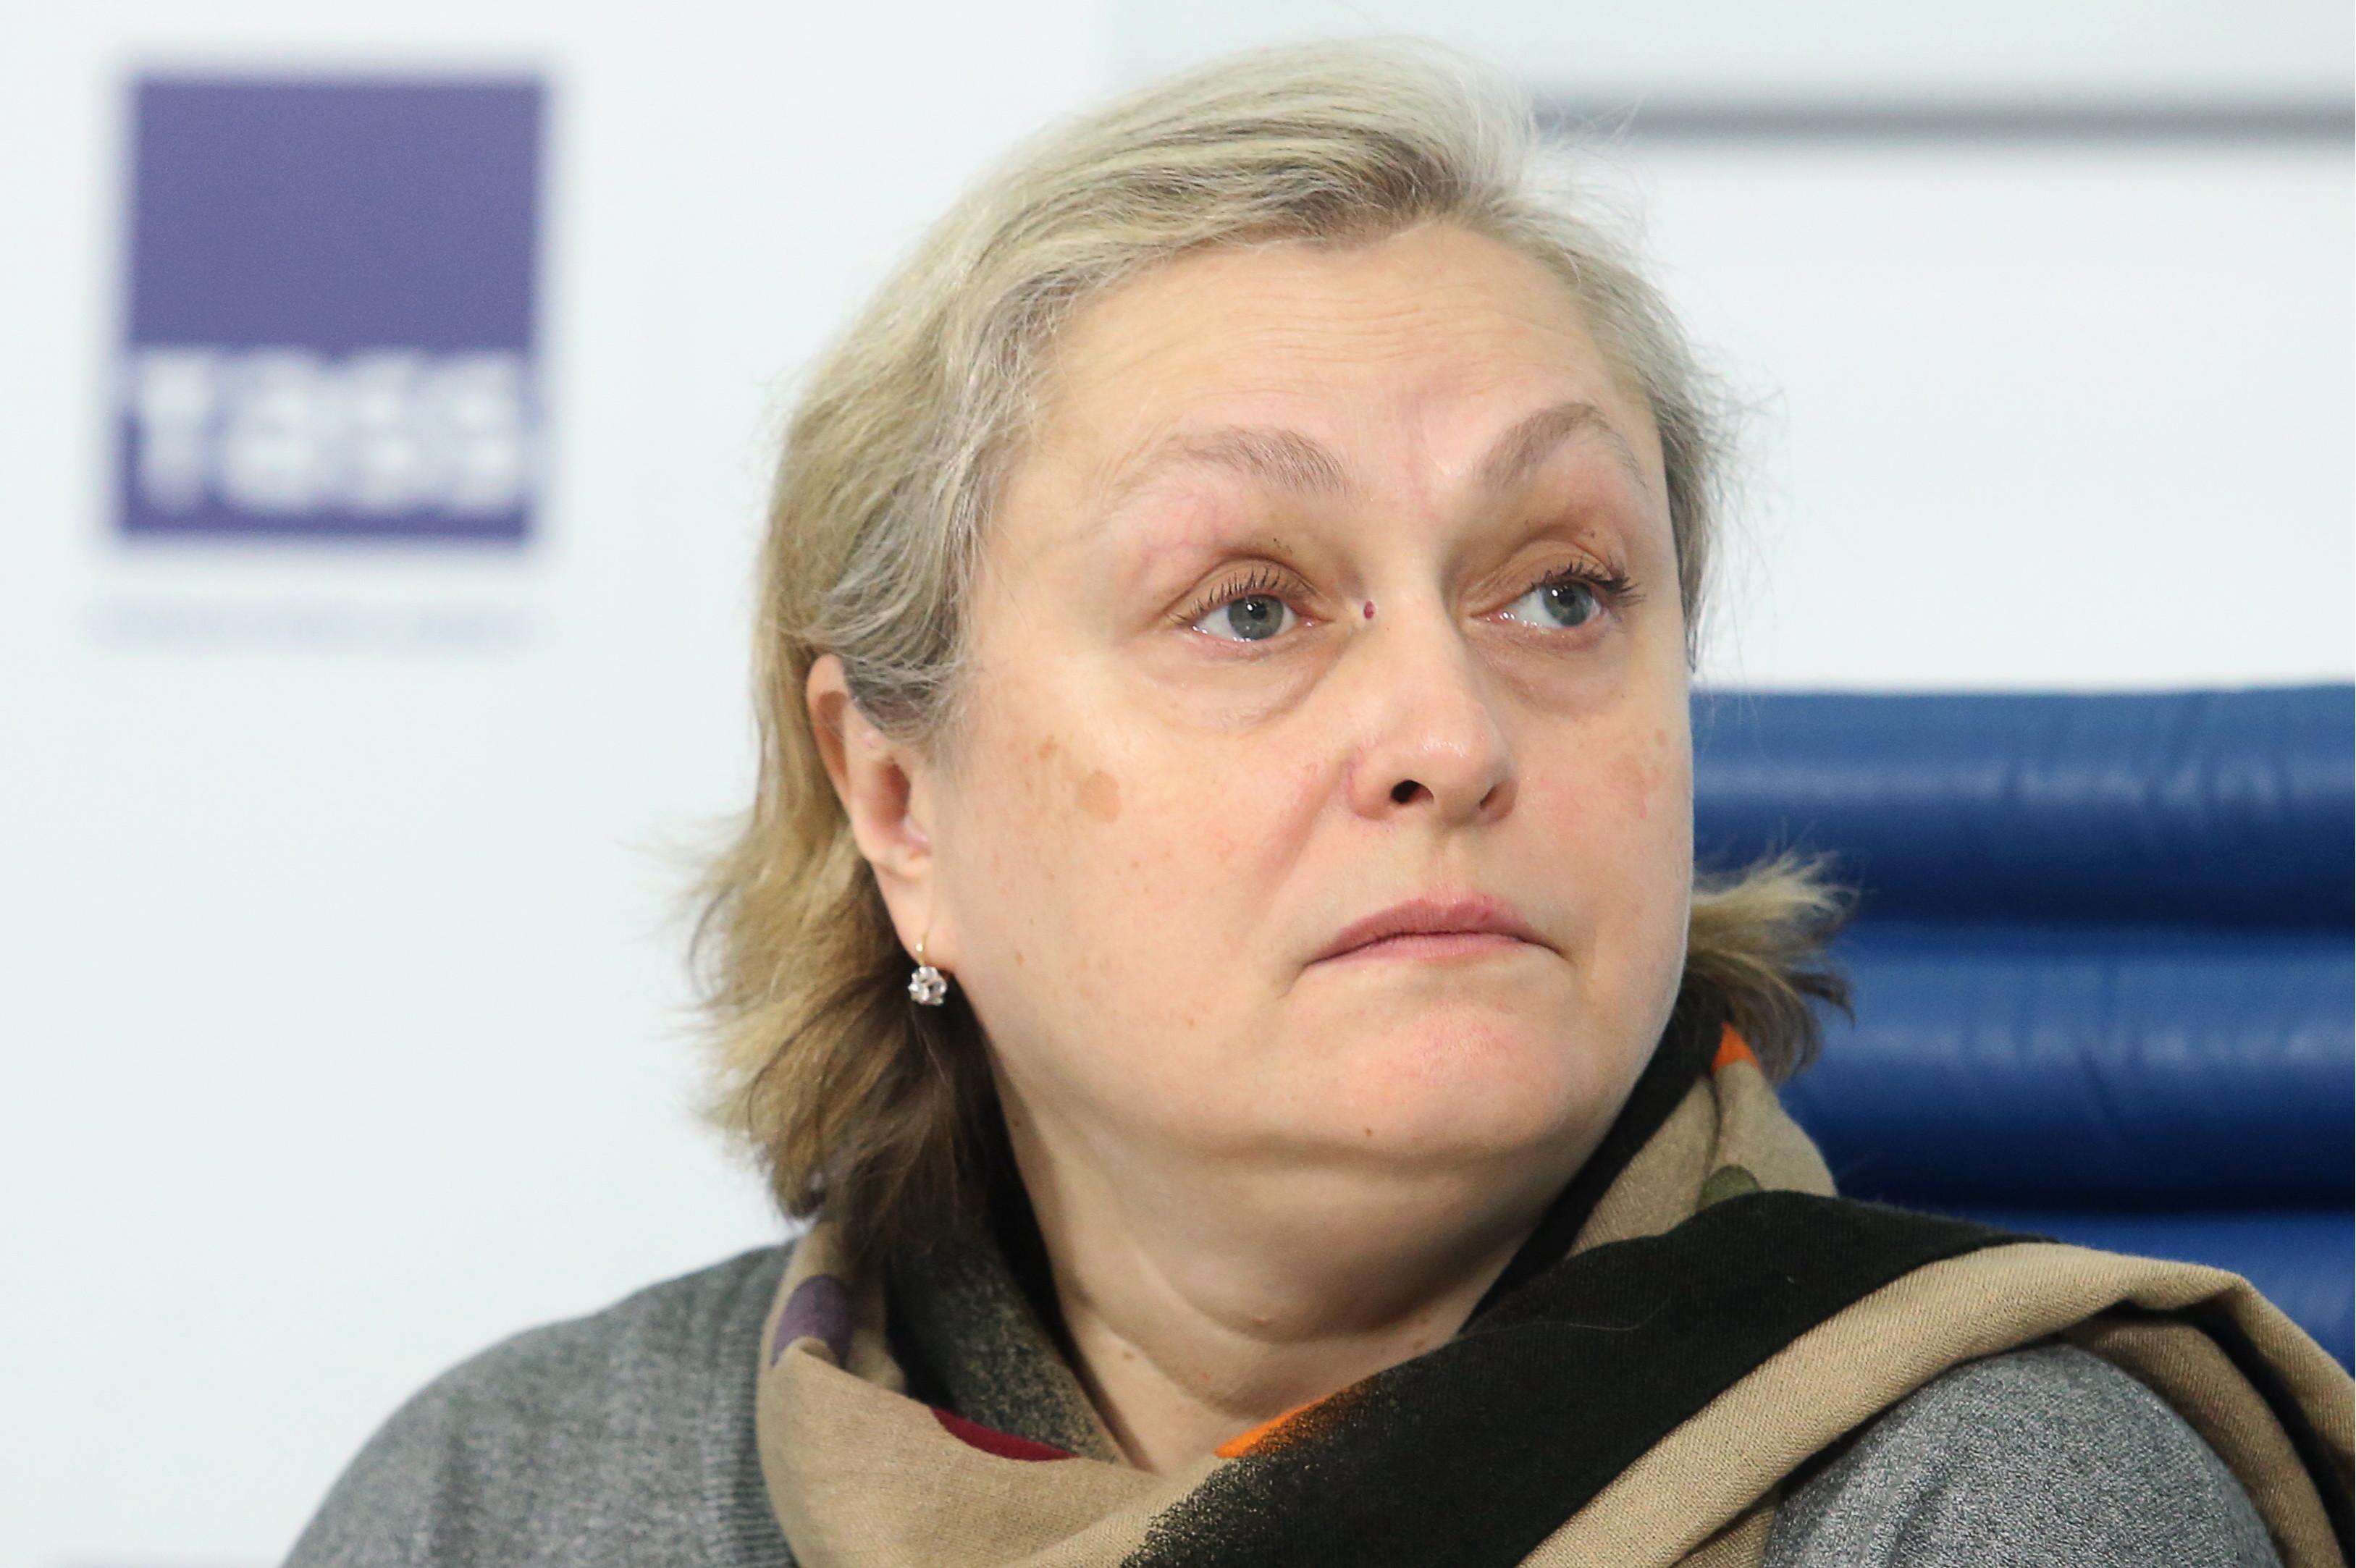 Вдове поэта Евтушенко вручена награда руководства РФ